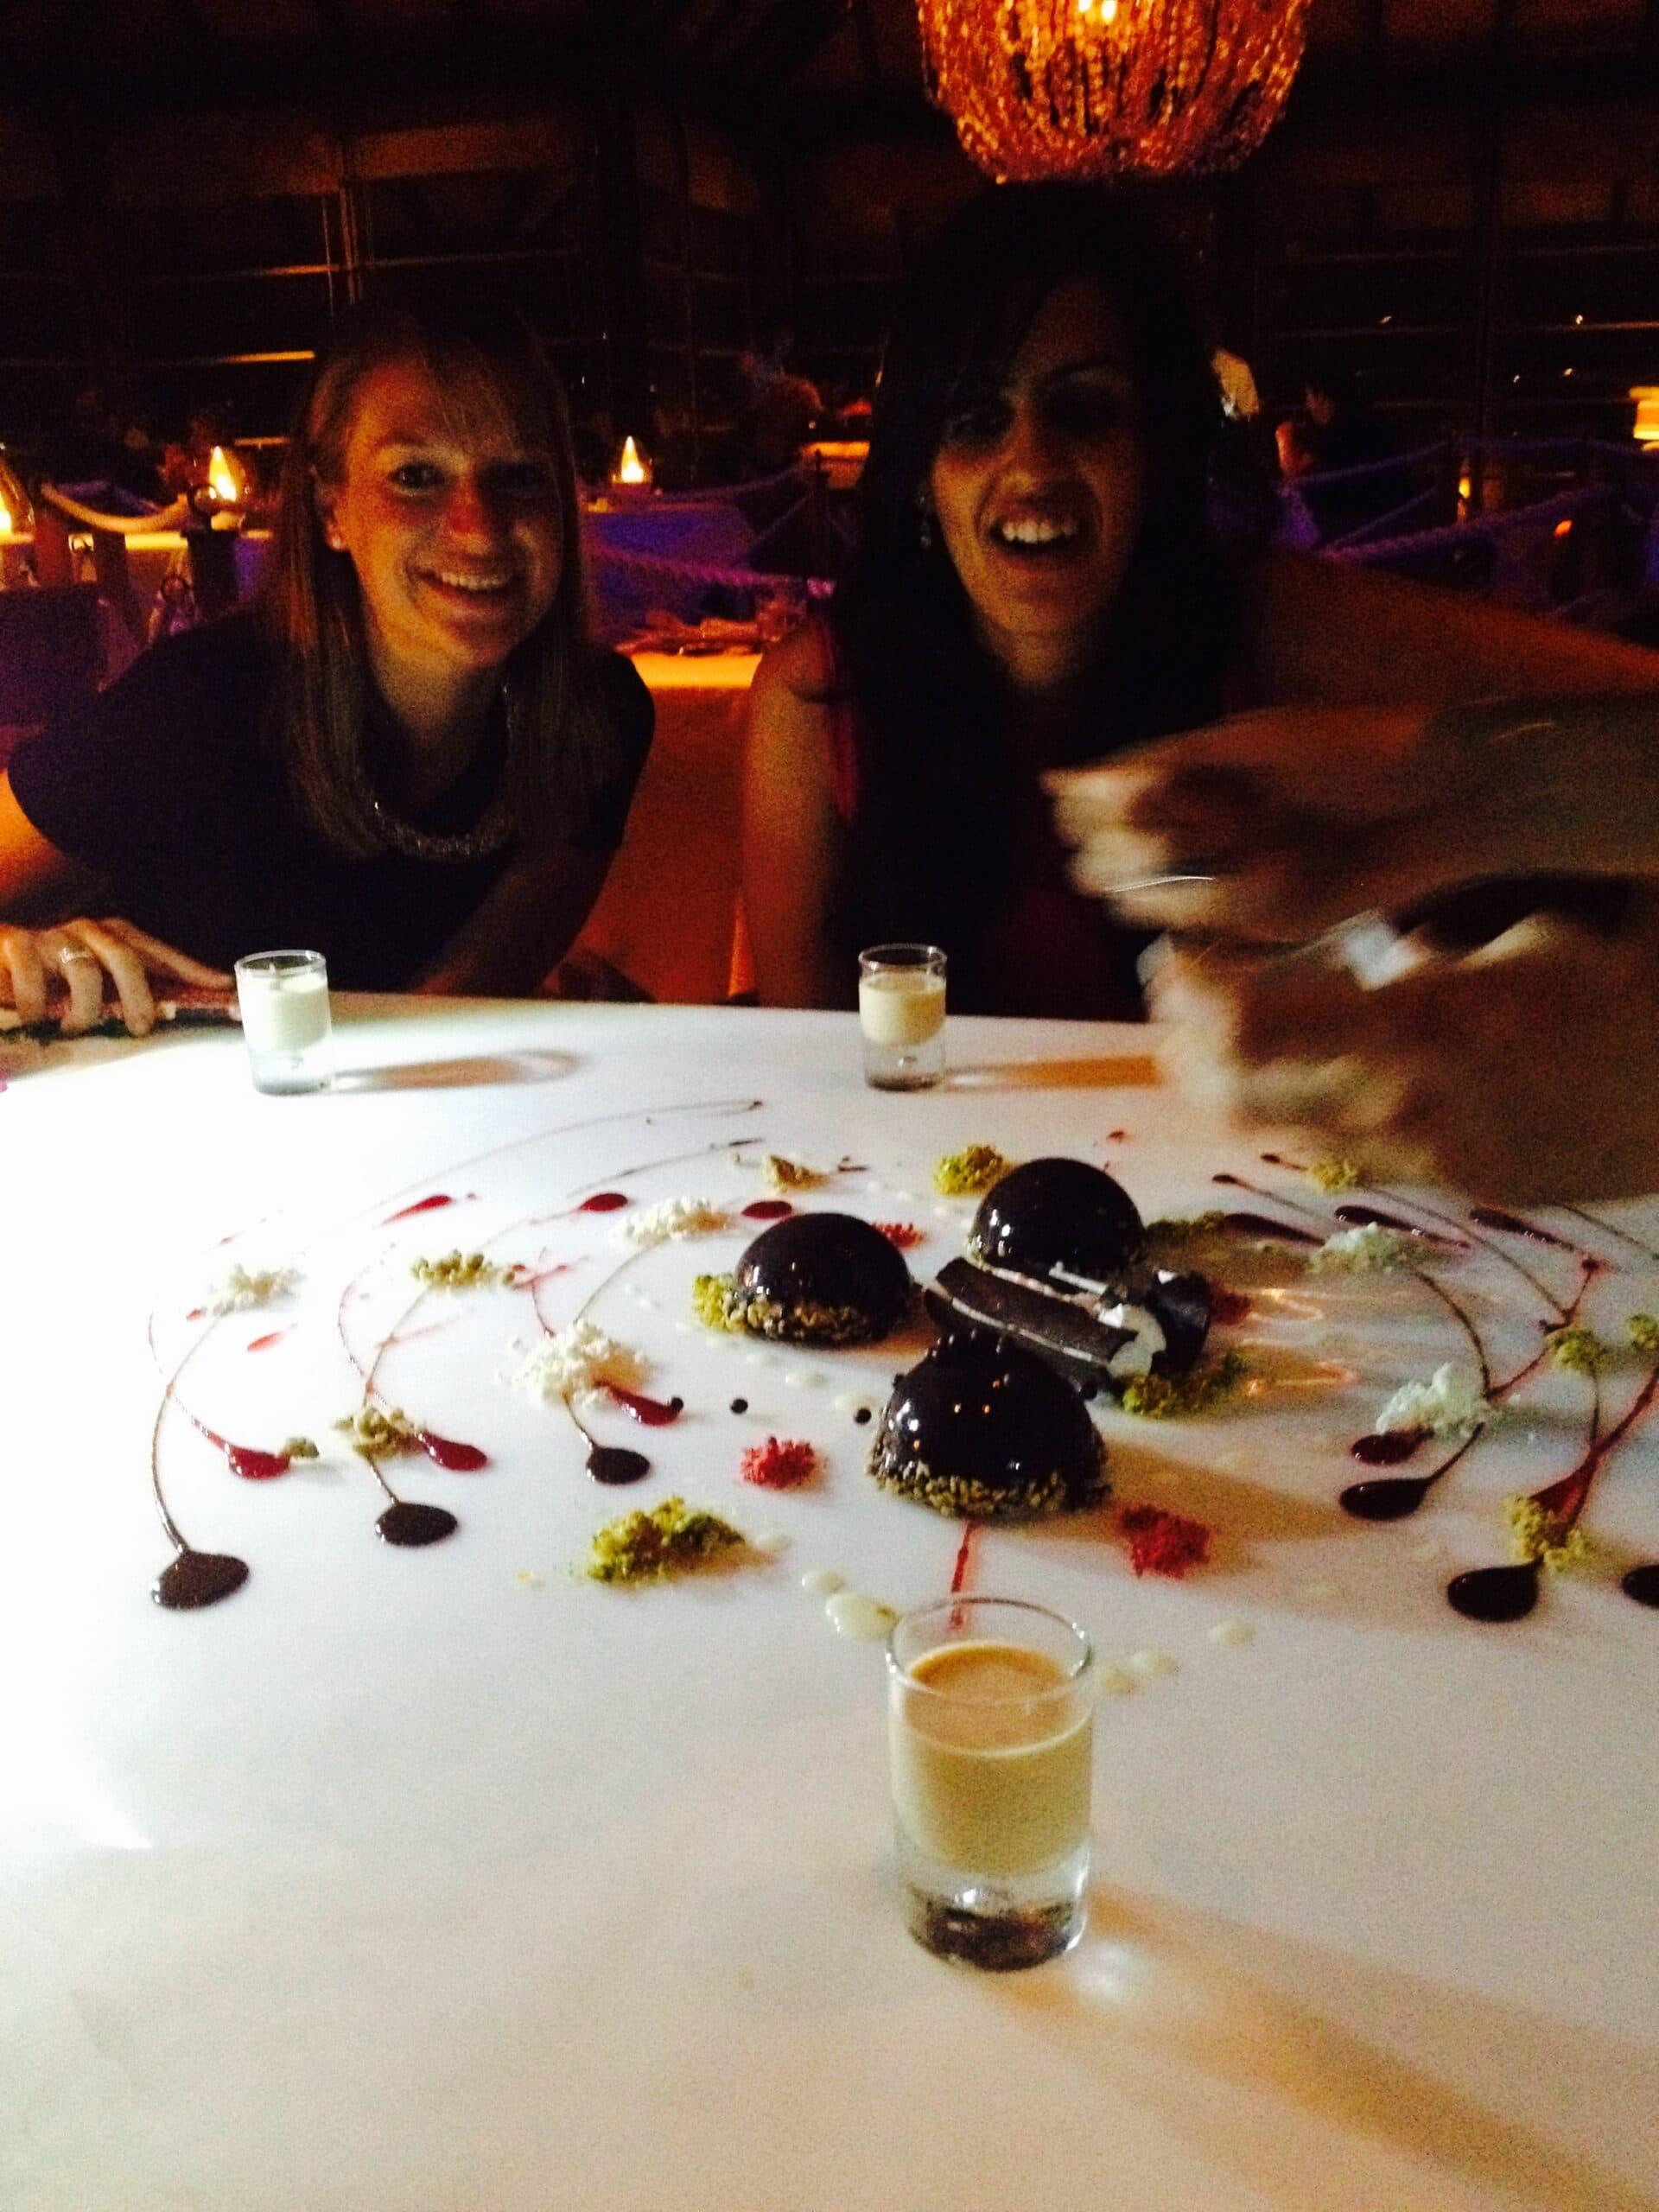 A magical dessert experience at Taj Exotica in the Maldives